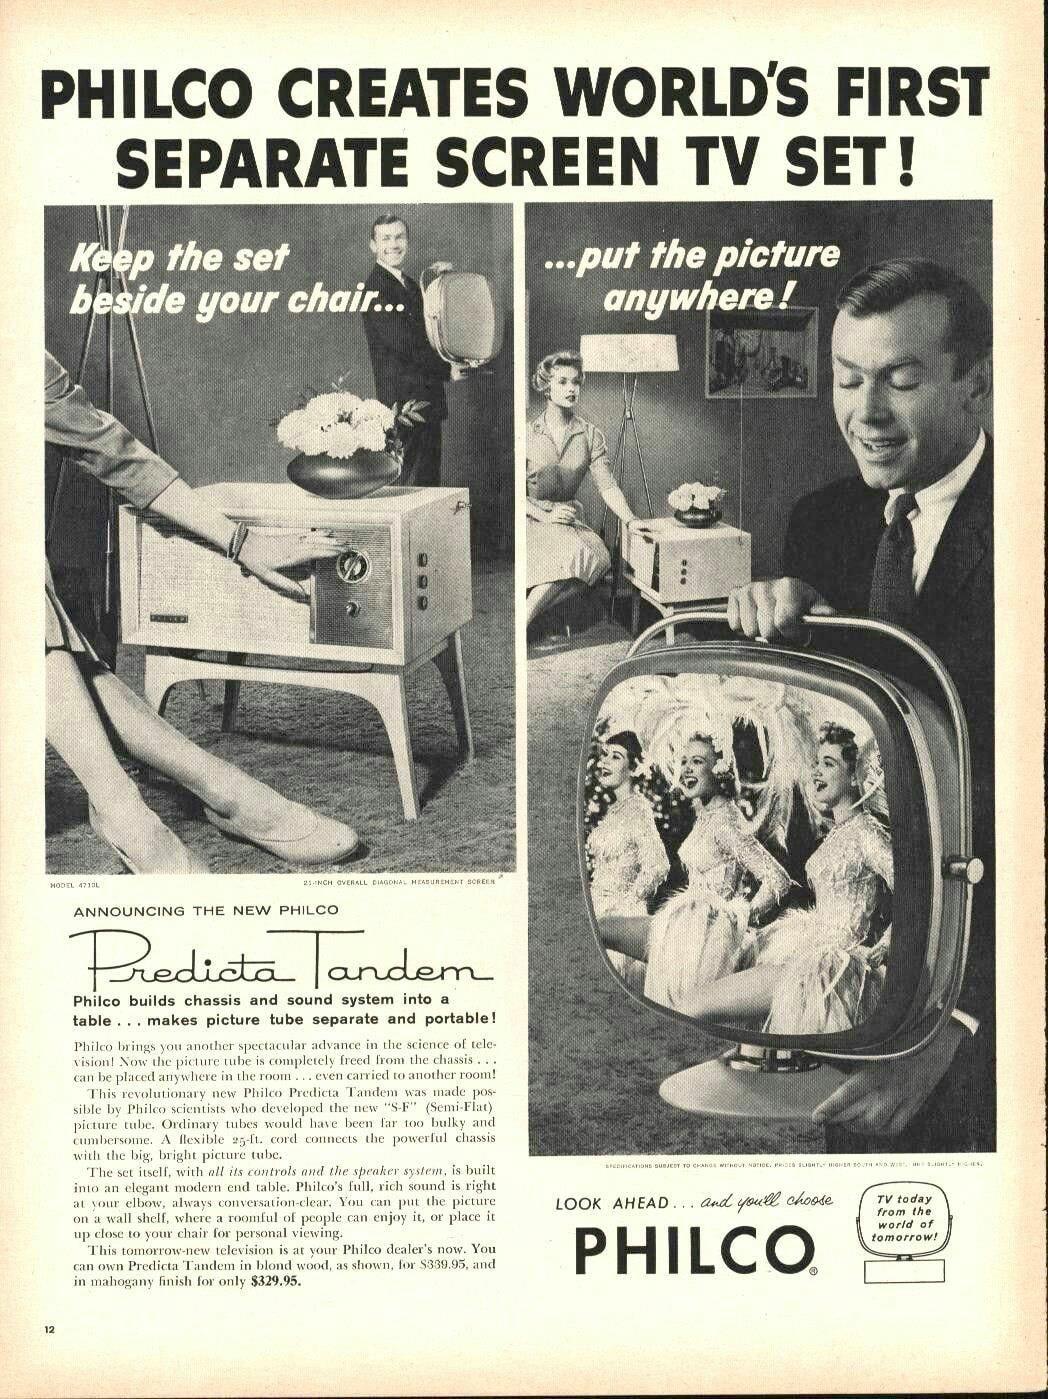 Philco Predicta Tandem advert from Life magazine, Oct. 20